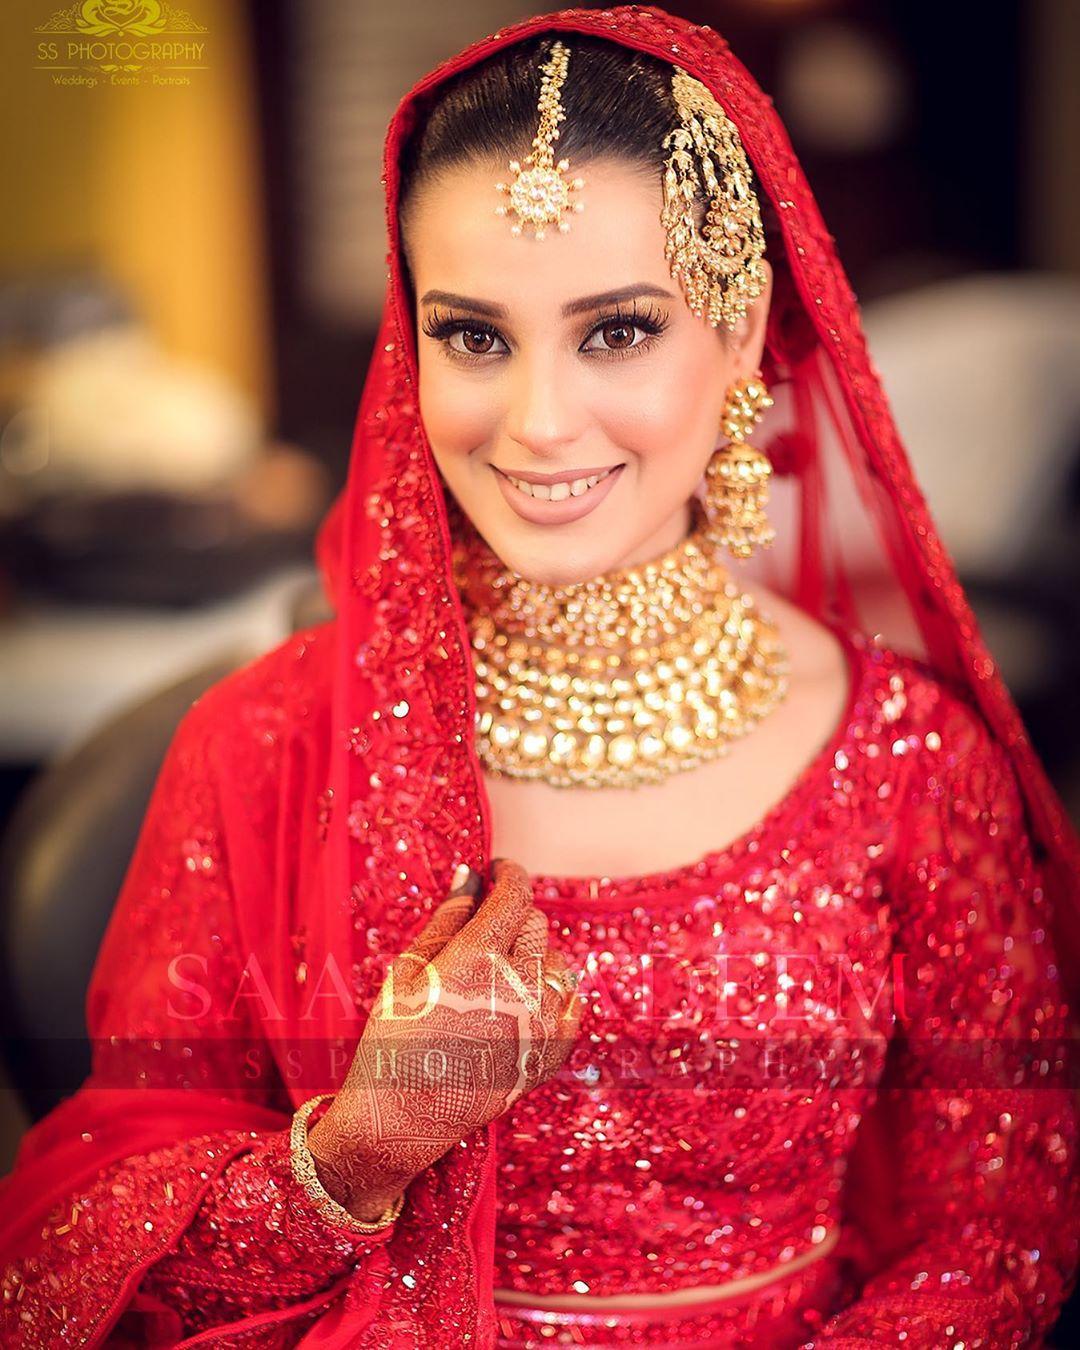 Iqra Aziz and Yasir Hussain Wedding Pictures (11)